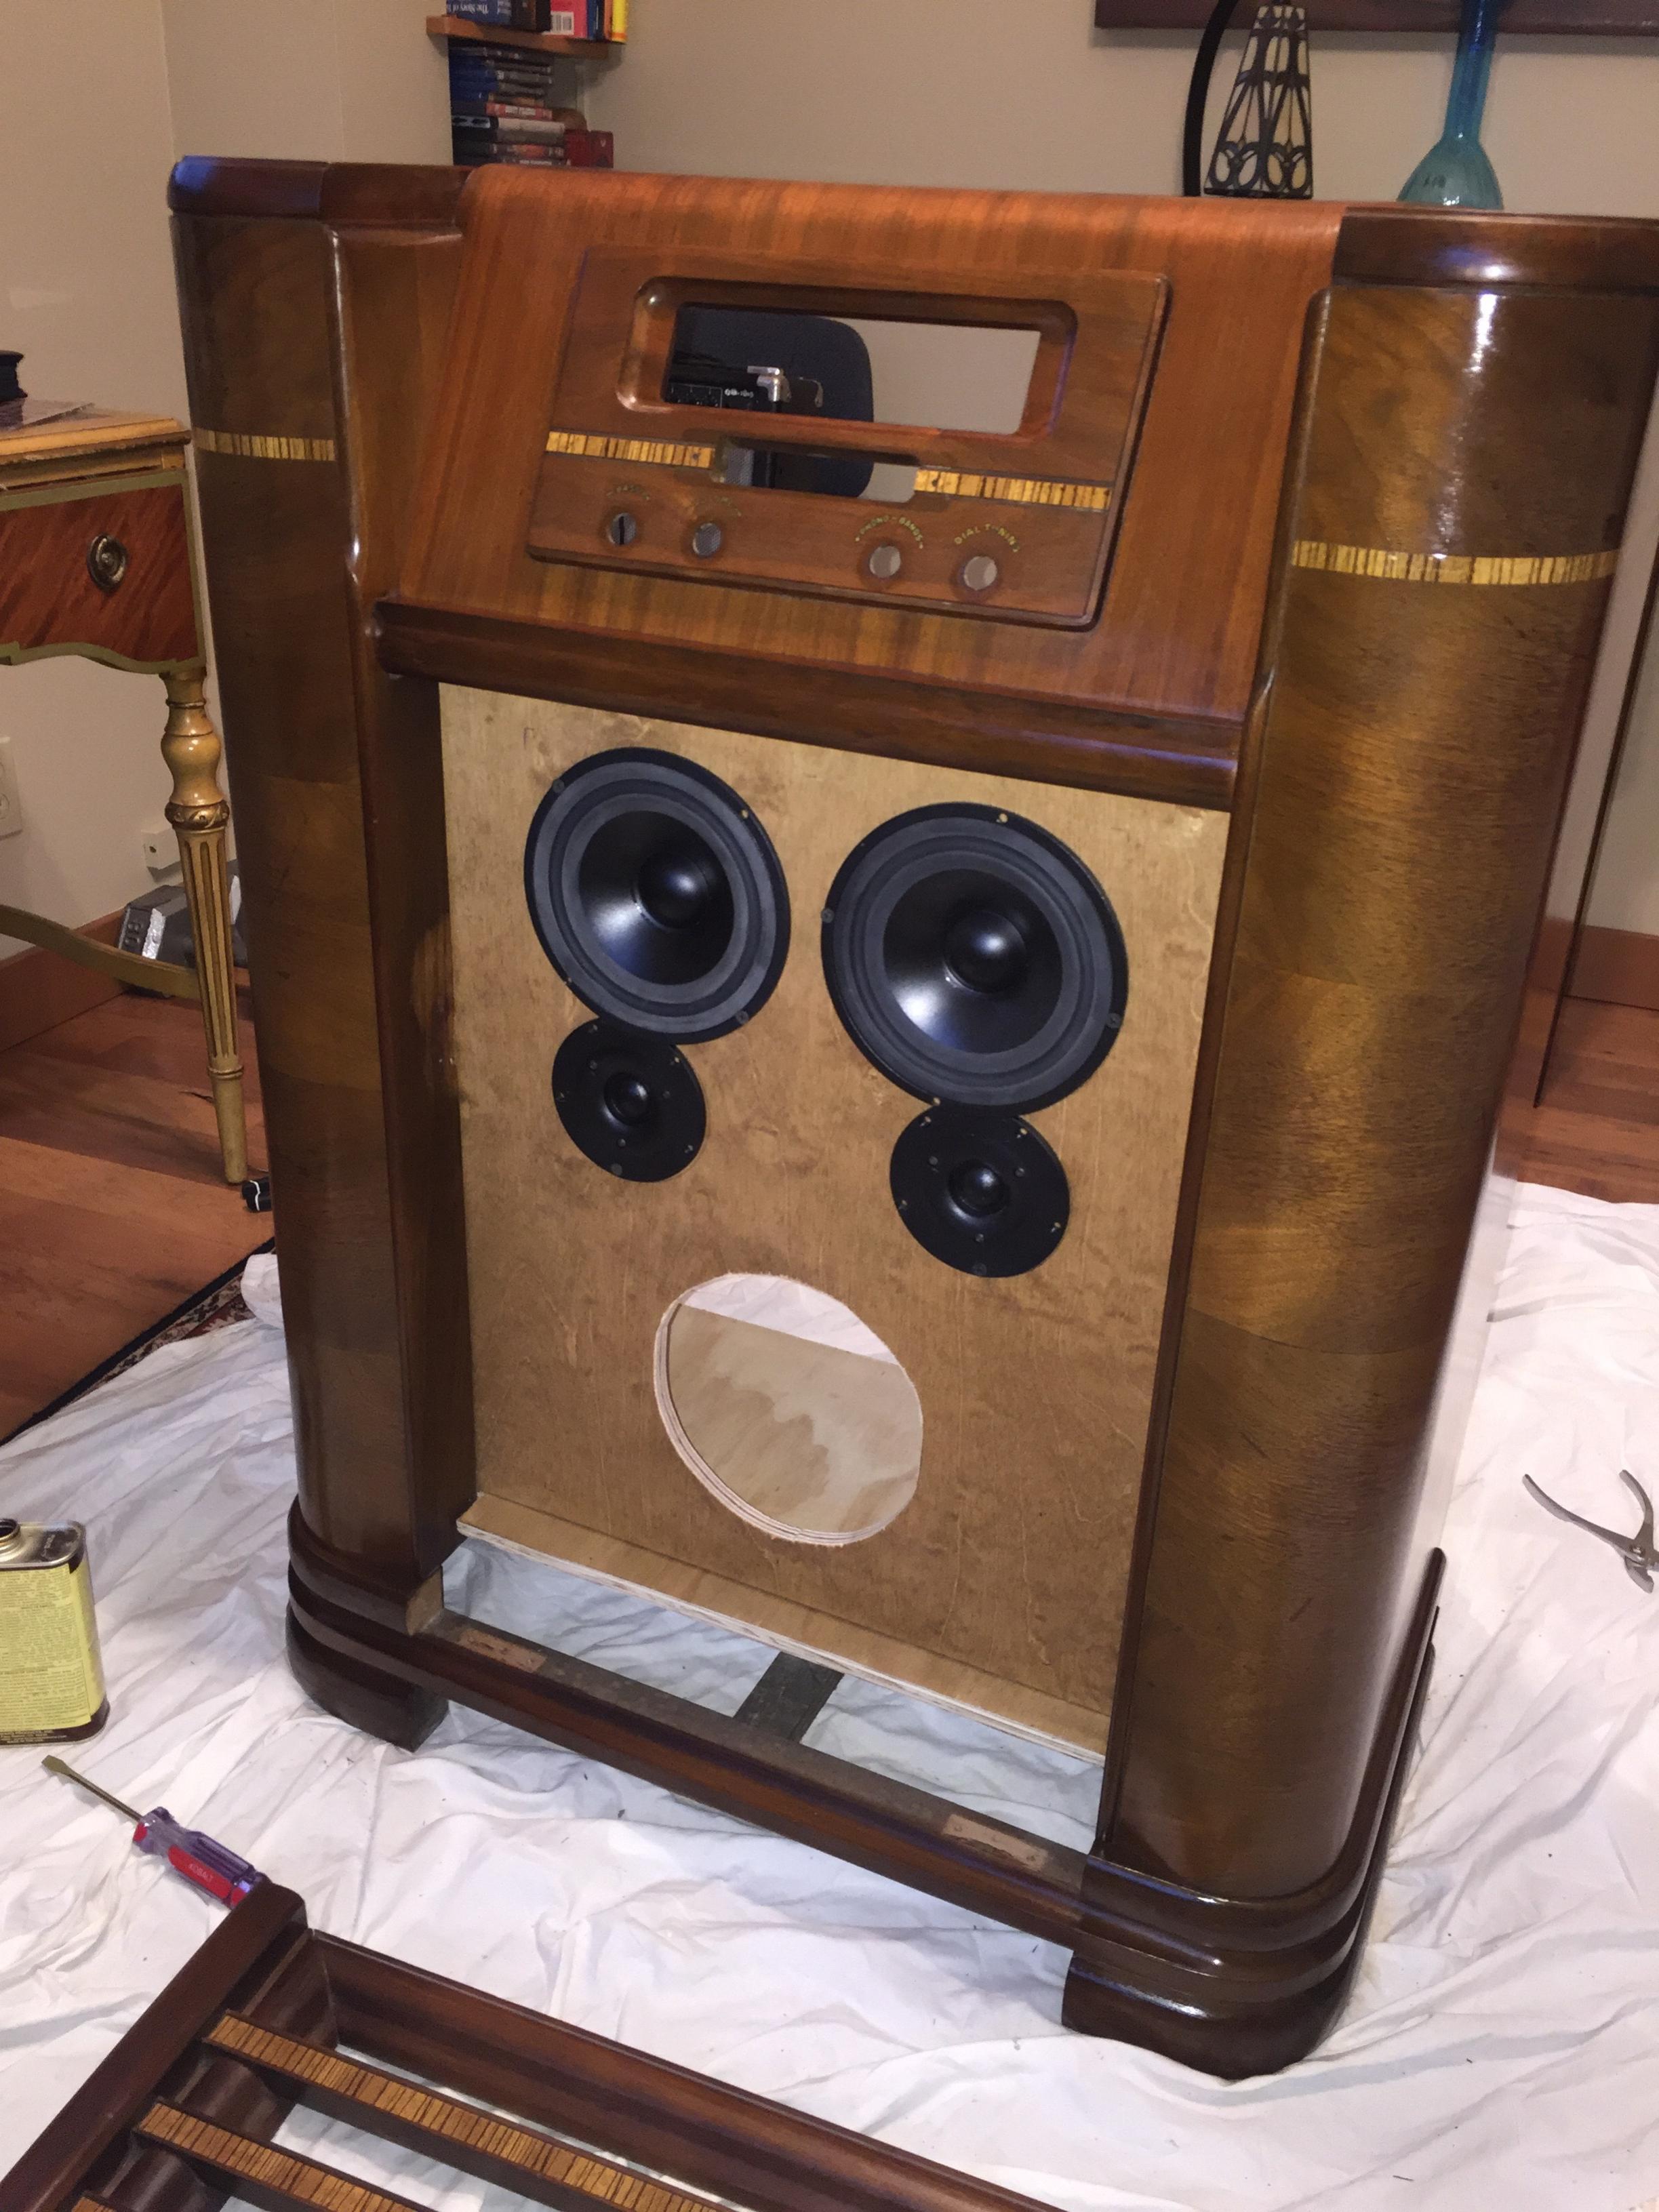 Old radio cabinet repurposed into speaker - Techtalk ...